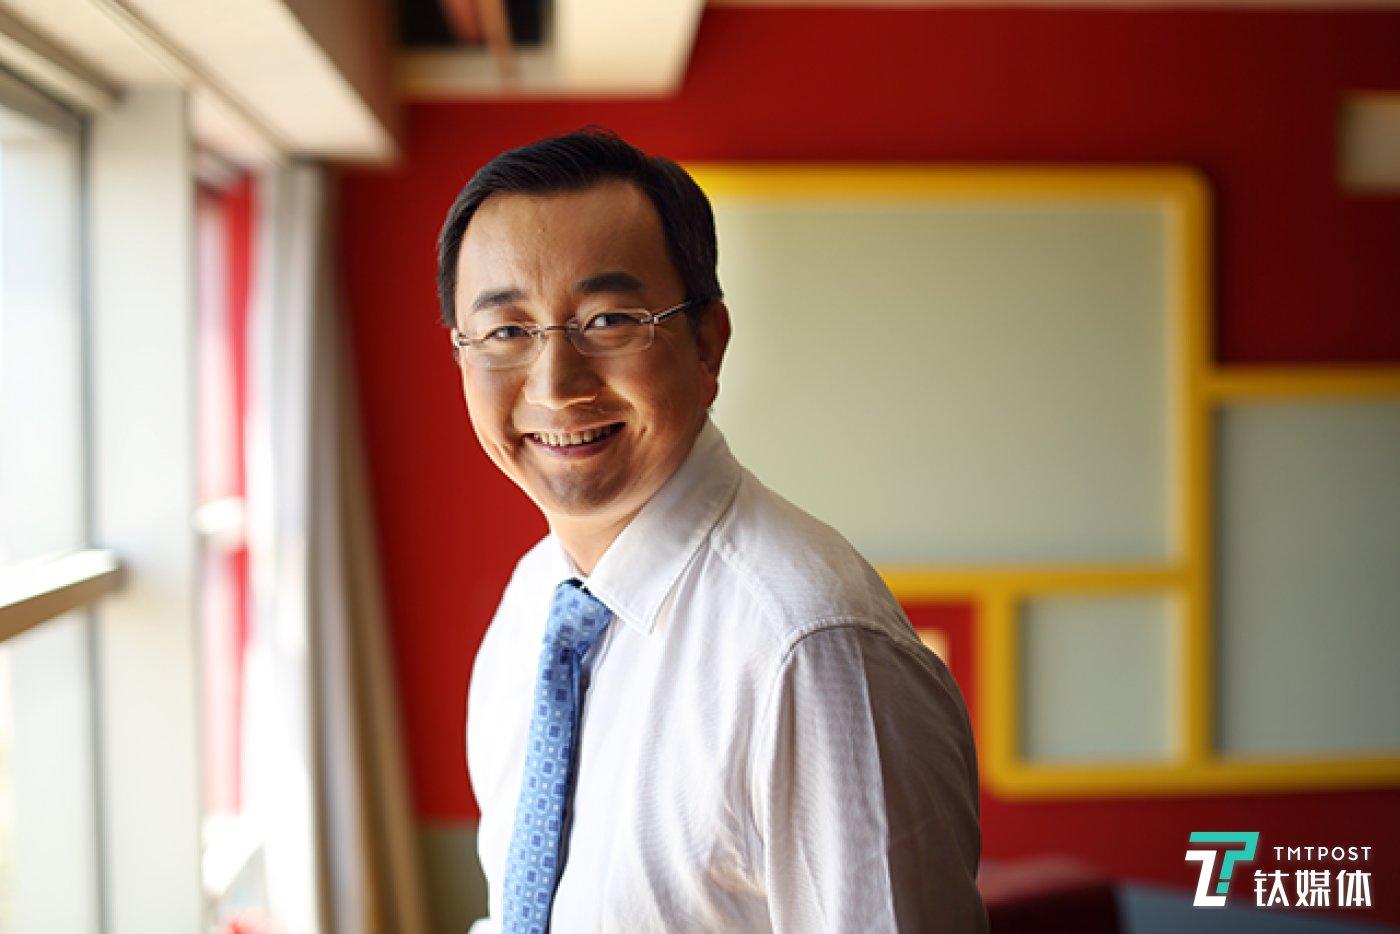 Wang Yulin, CEO of Kingsoft Cloud